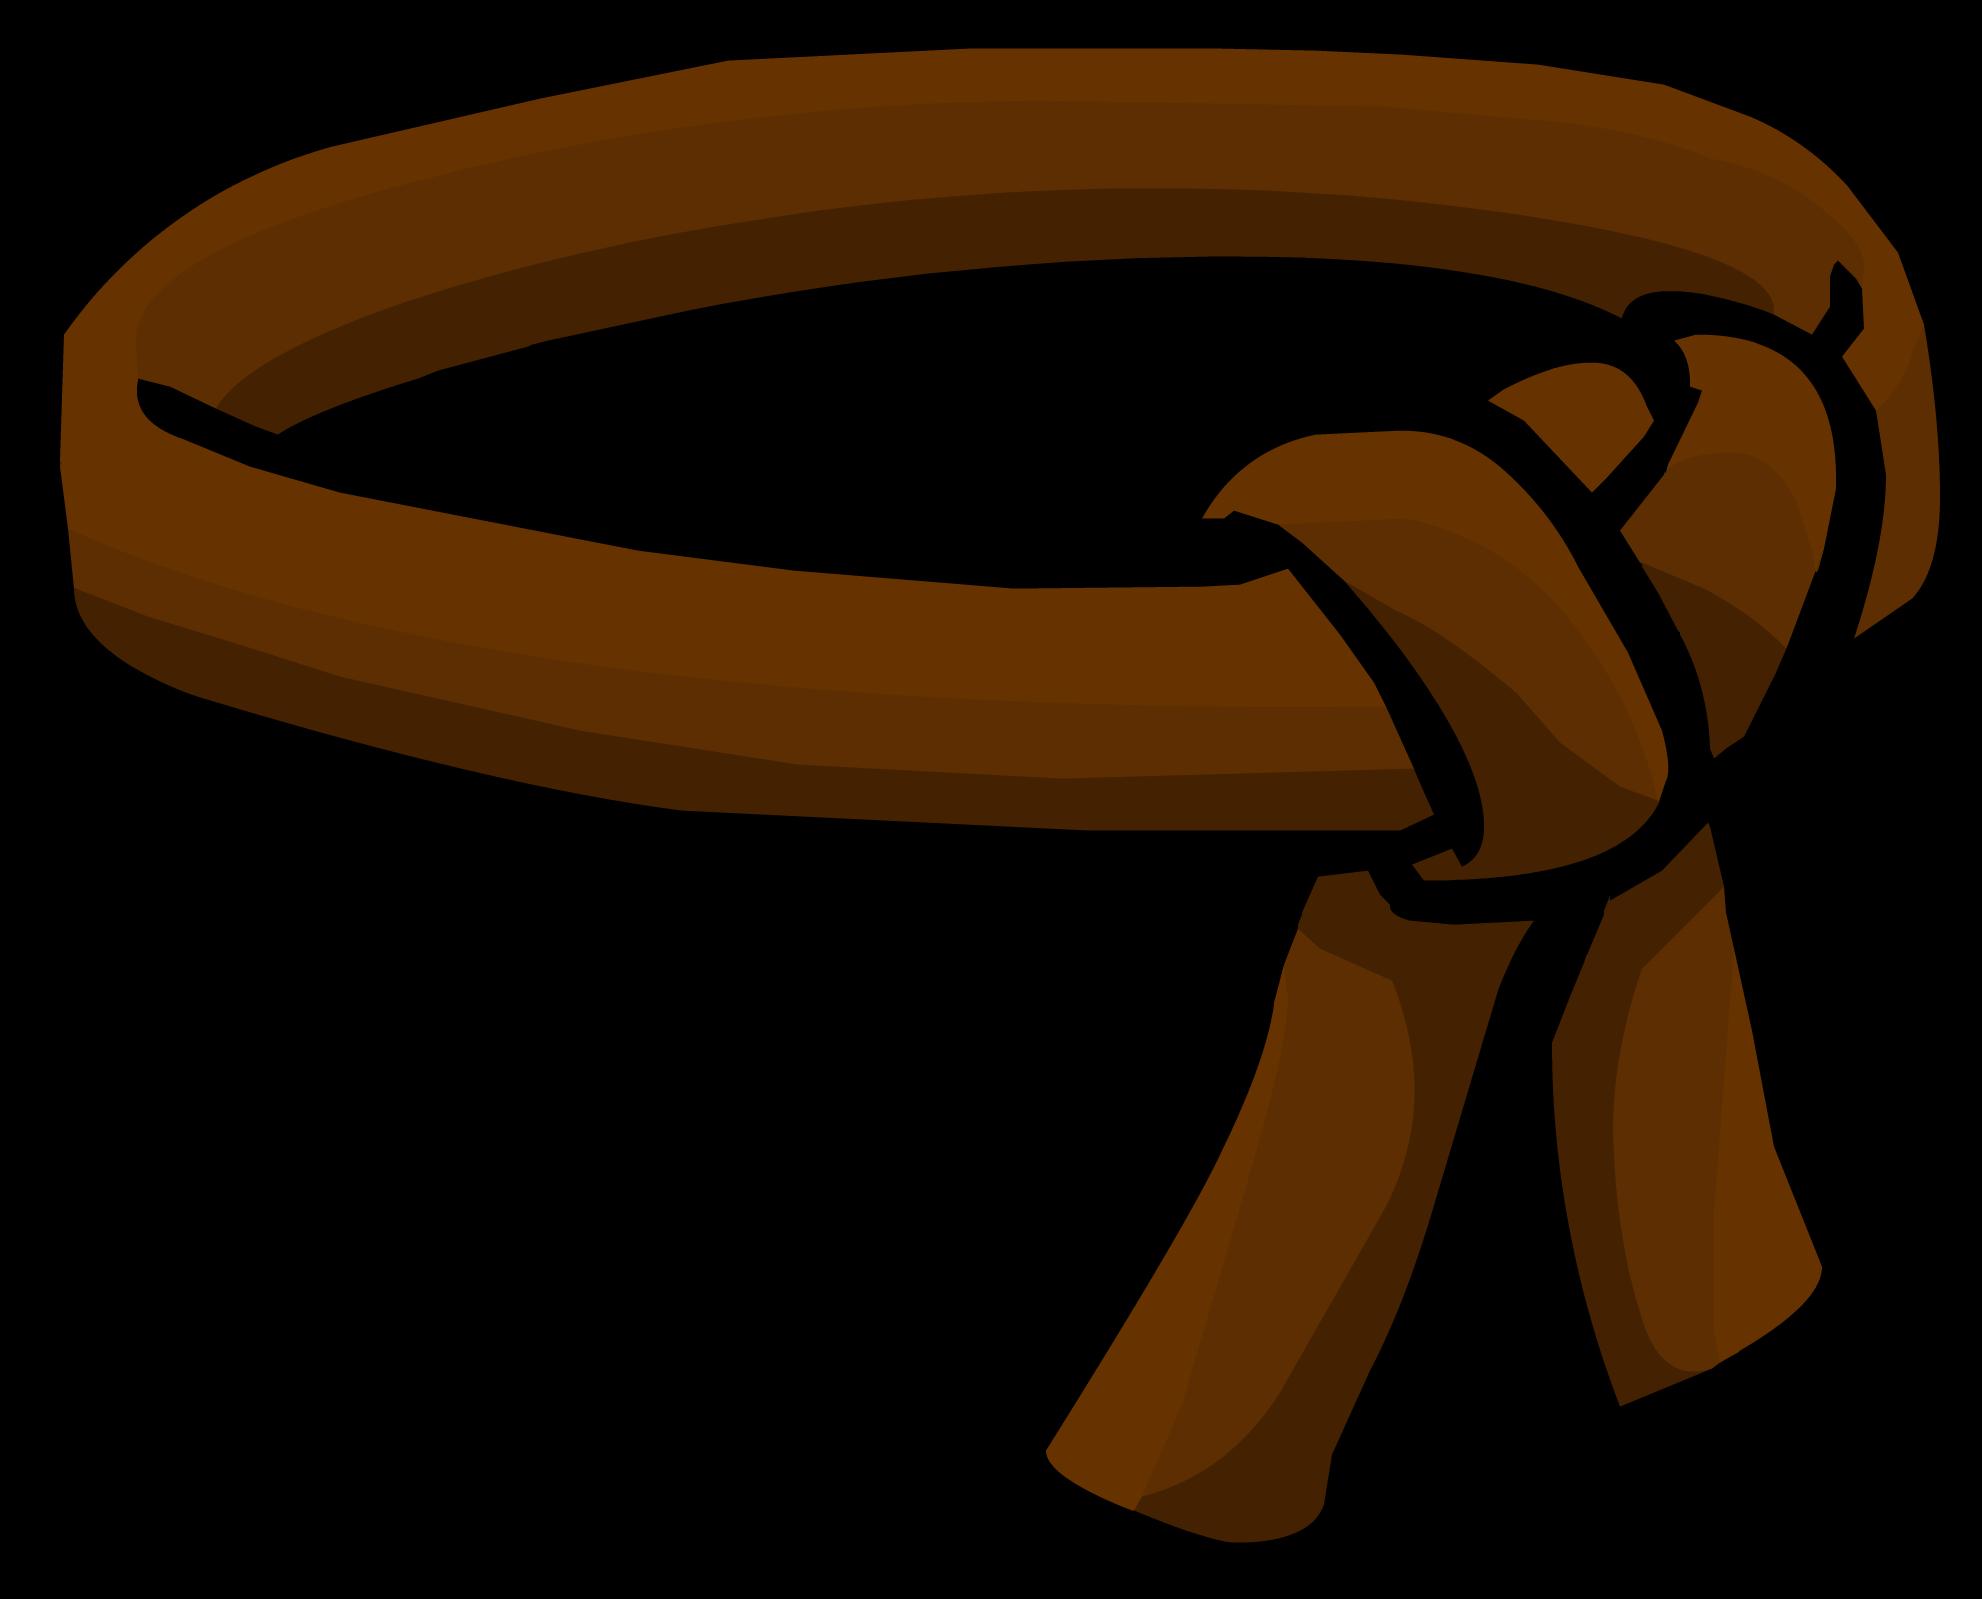 Belt clipart brown belt. Ninja club penguin wiki